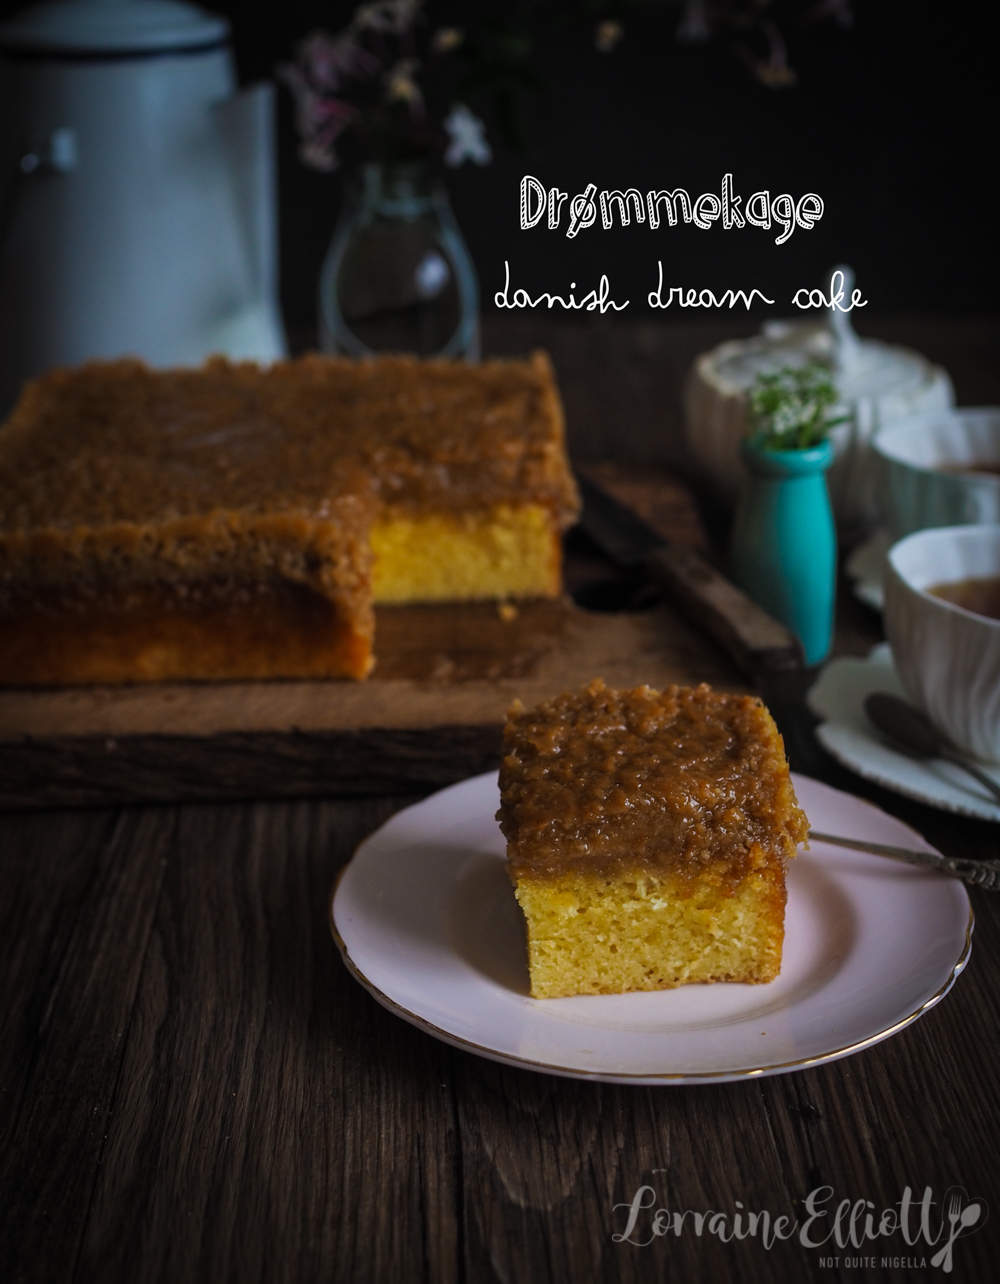 Drømmekage Danish Dream Cake